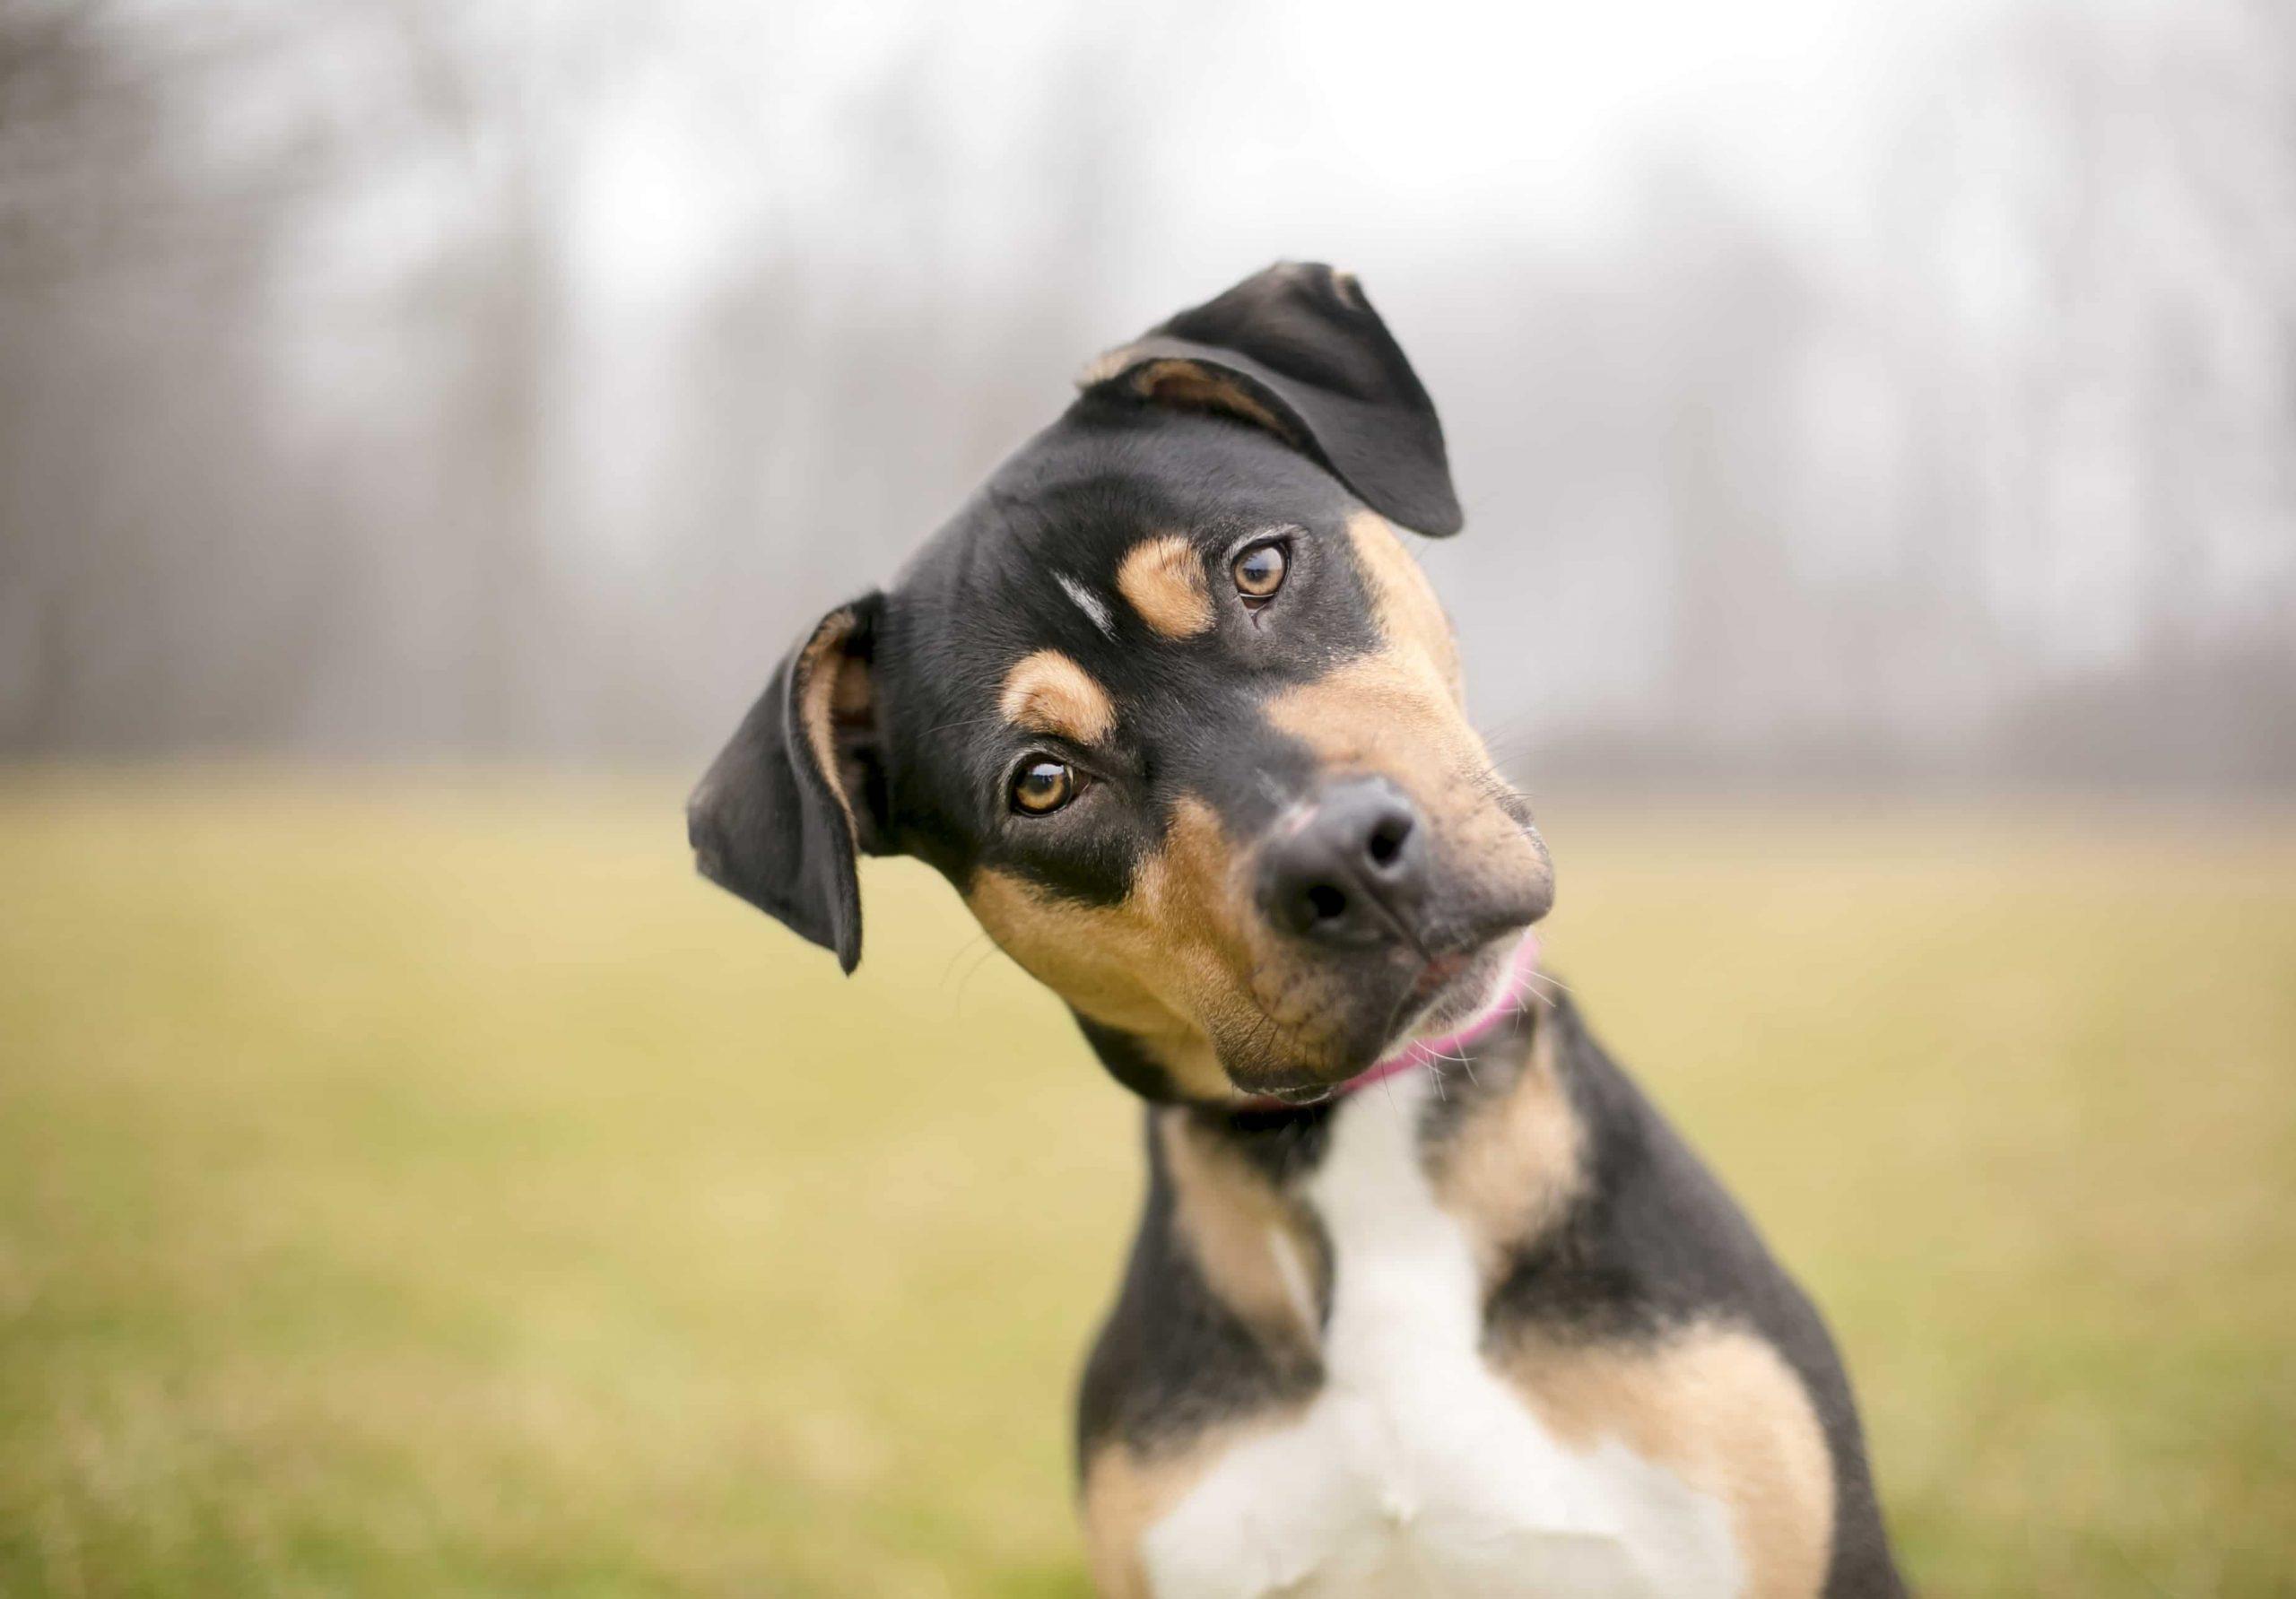 Photo of 11 حقیقت جالب در مورد سگ ها + واقعیت های خواندنی در مورد سگ